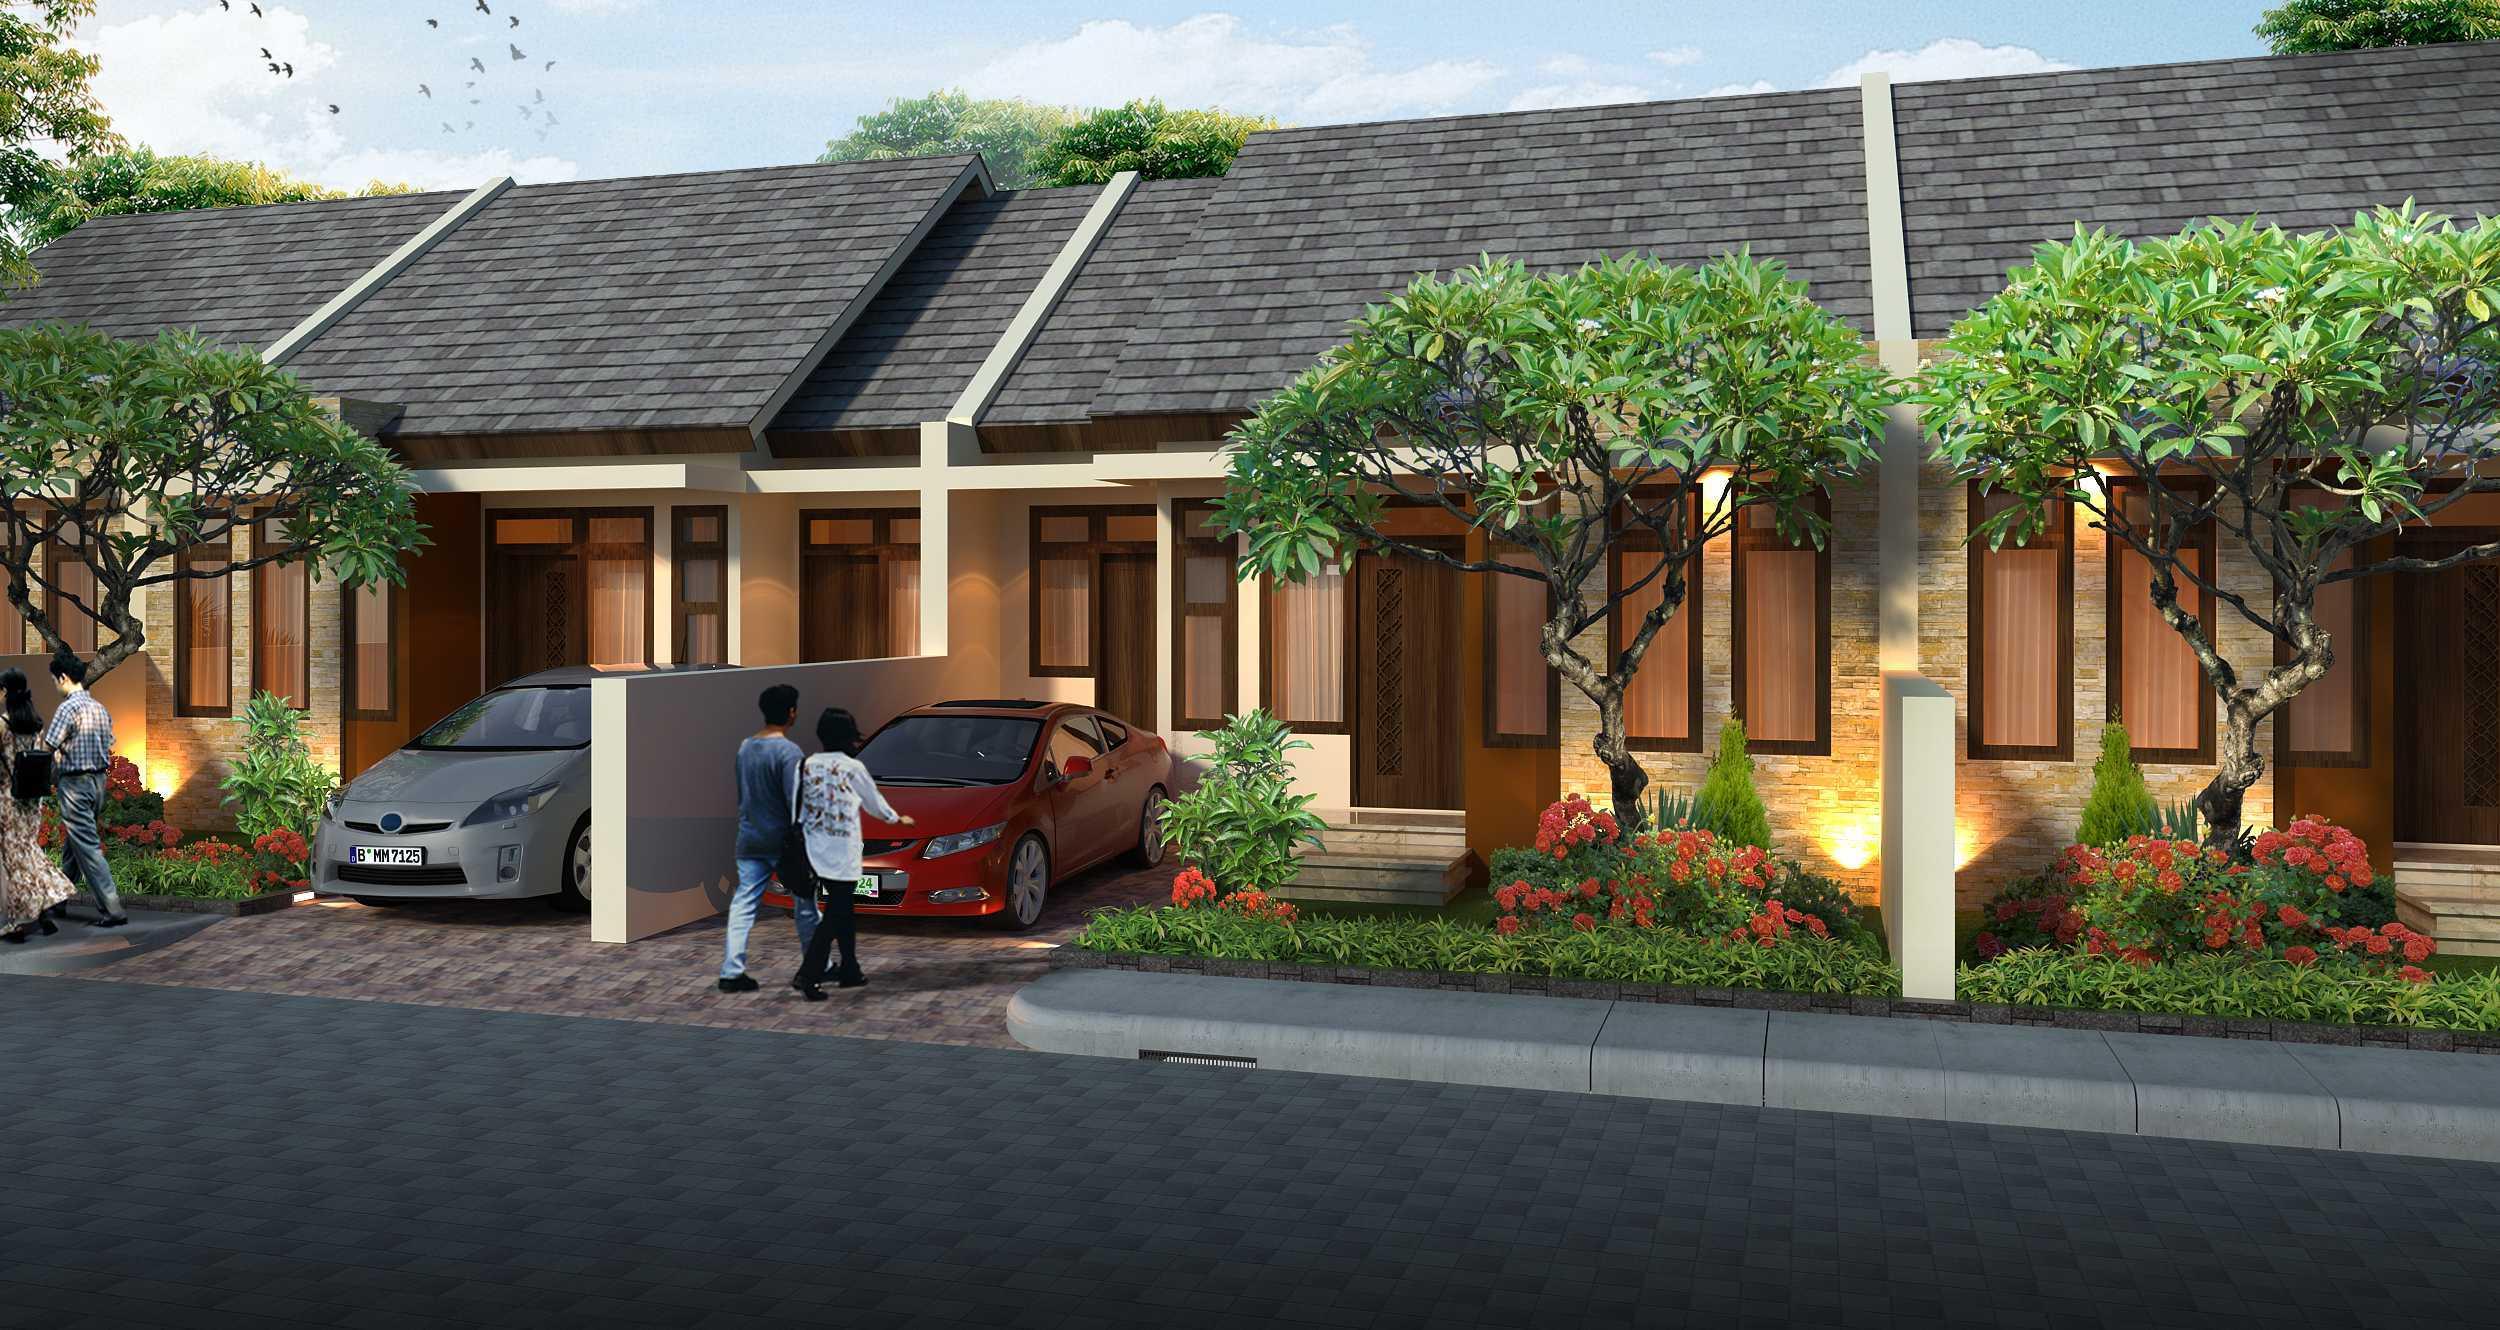 Rdesign Balikpapan Regency Metro Residence, Balikpapan Metro Residence, Balikpapan Front View   17972